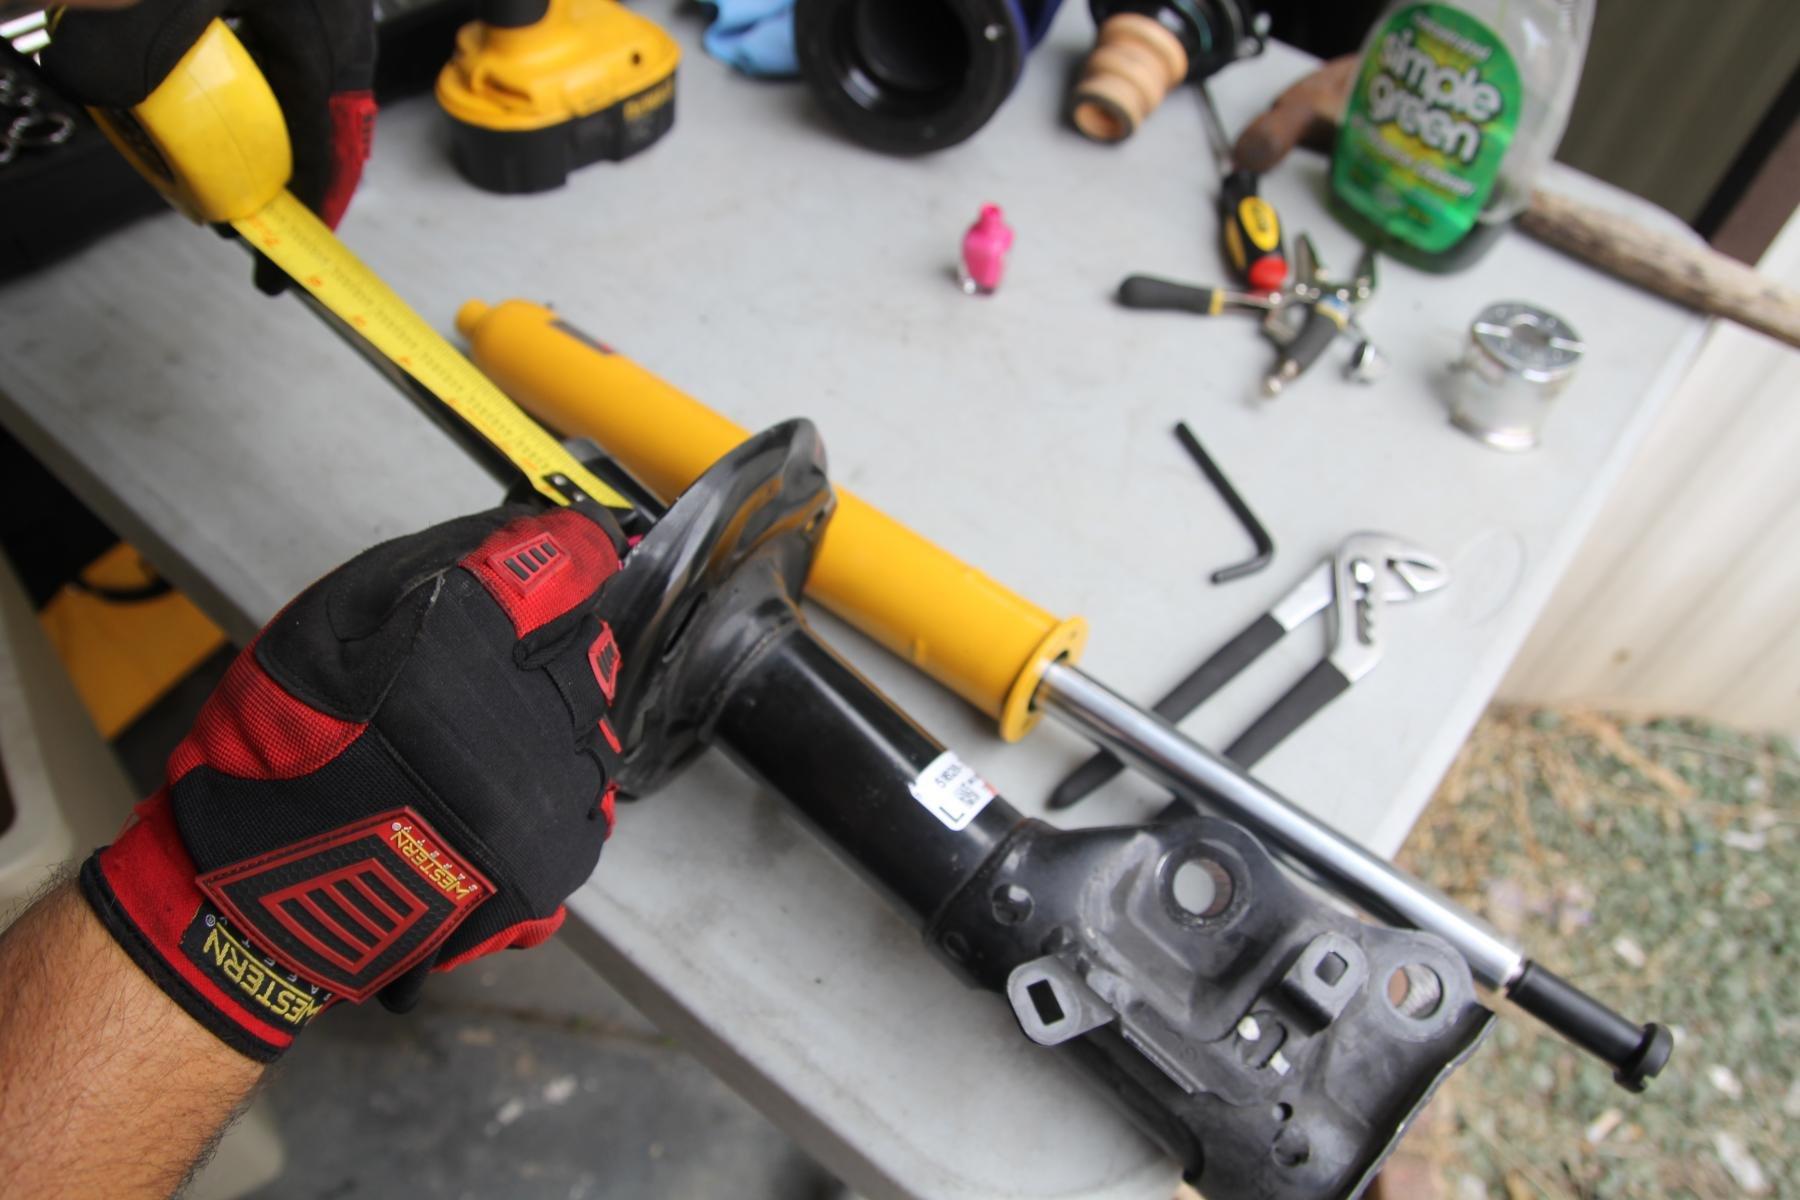 Koni Front Shock Intsall DIY. PIC HEAVY THREAD!-img_2986.jpg